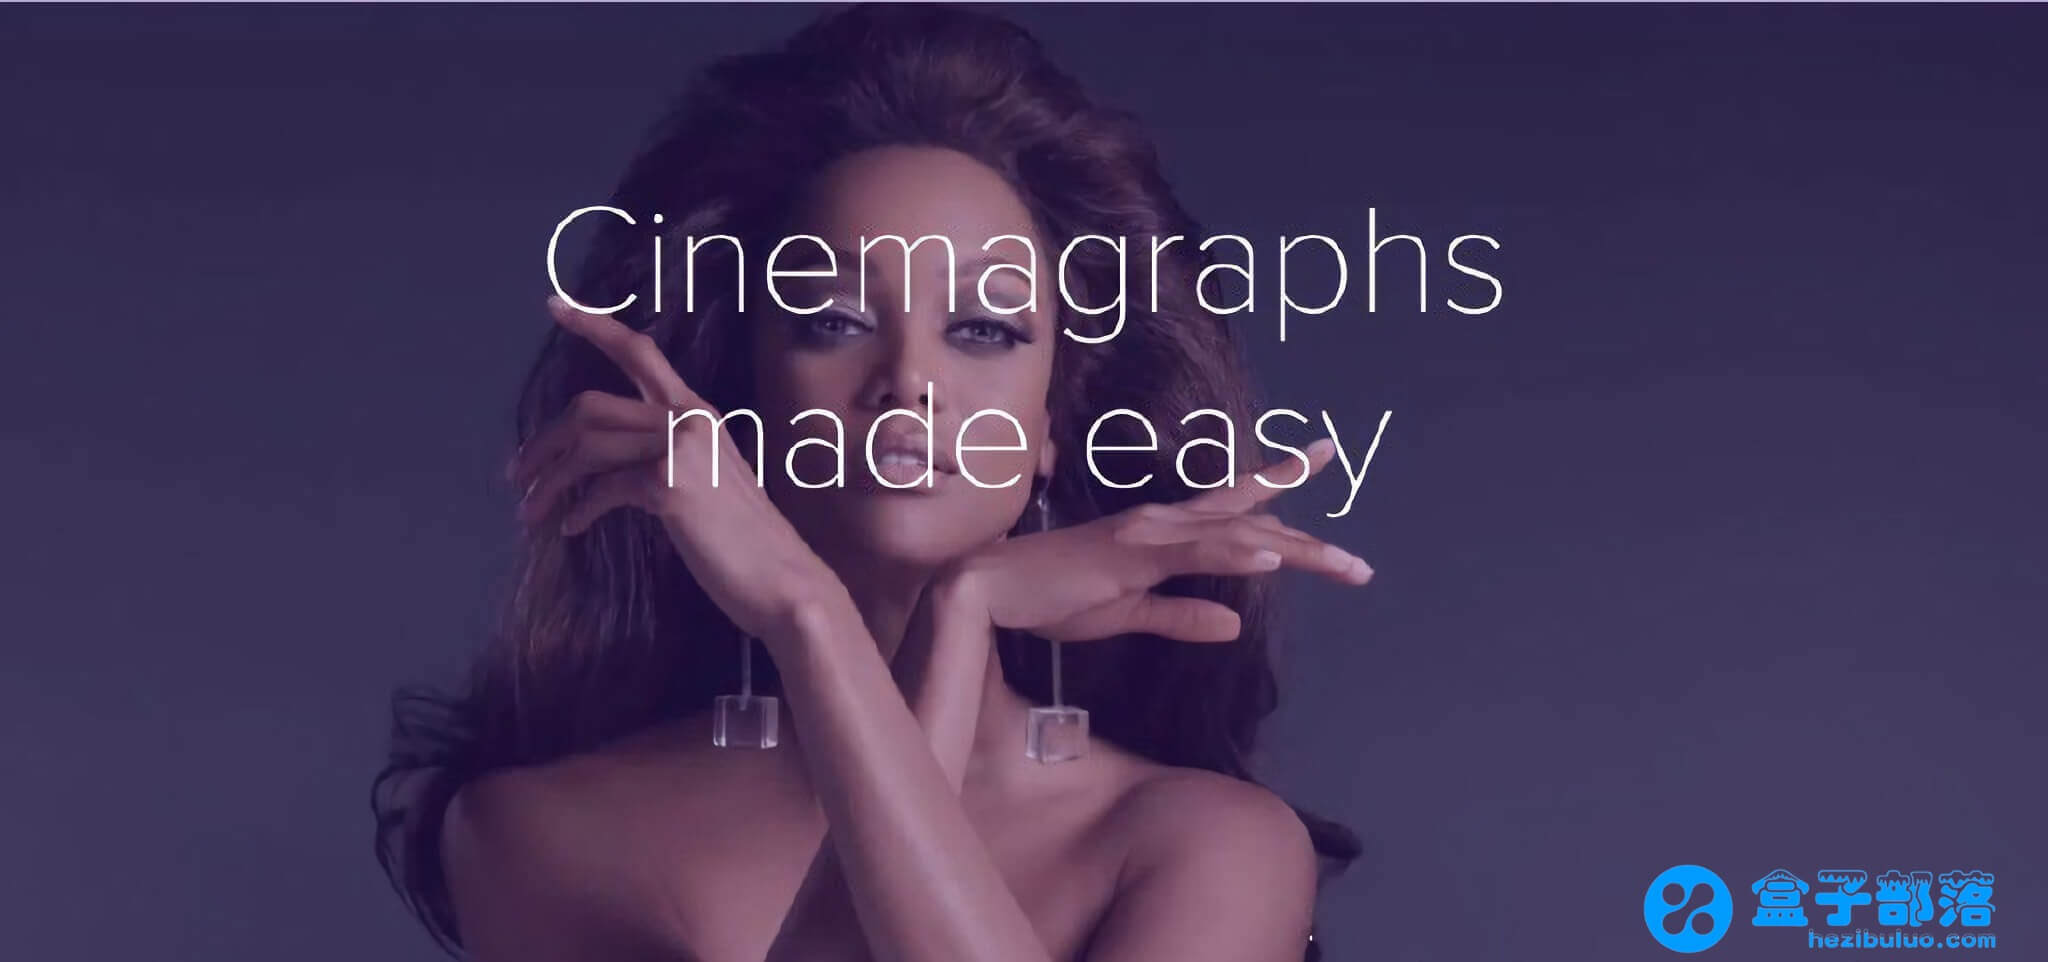 Cinemagraph Pro 2.6.1 一款专业的动态图片与视频制作工具